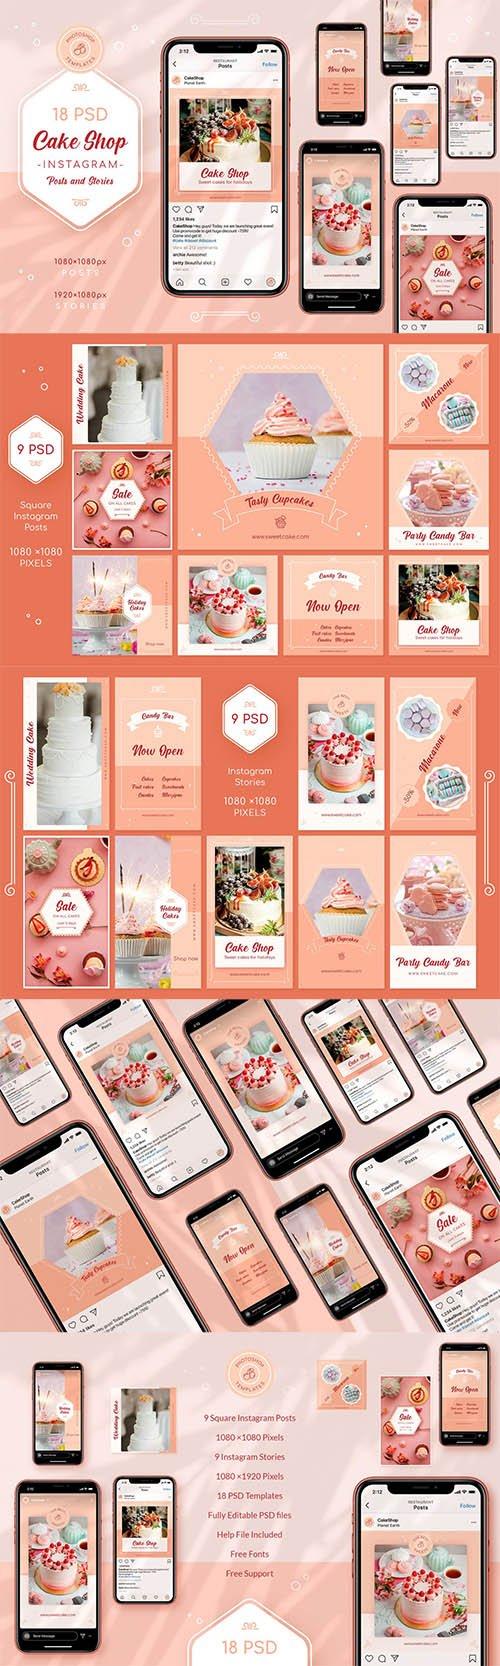 Cake Shop Instagram Posts & Stories